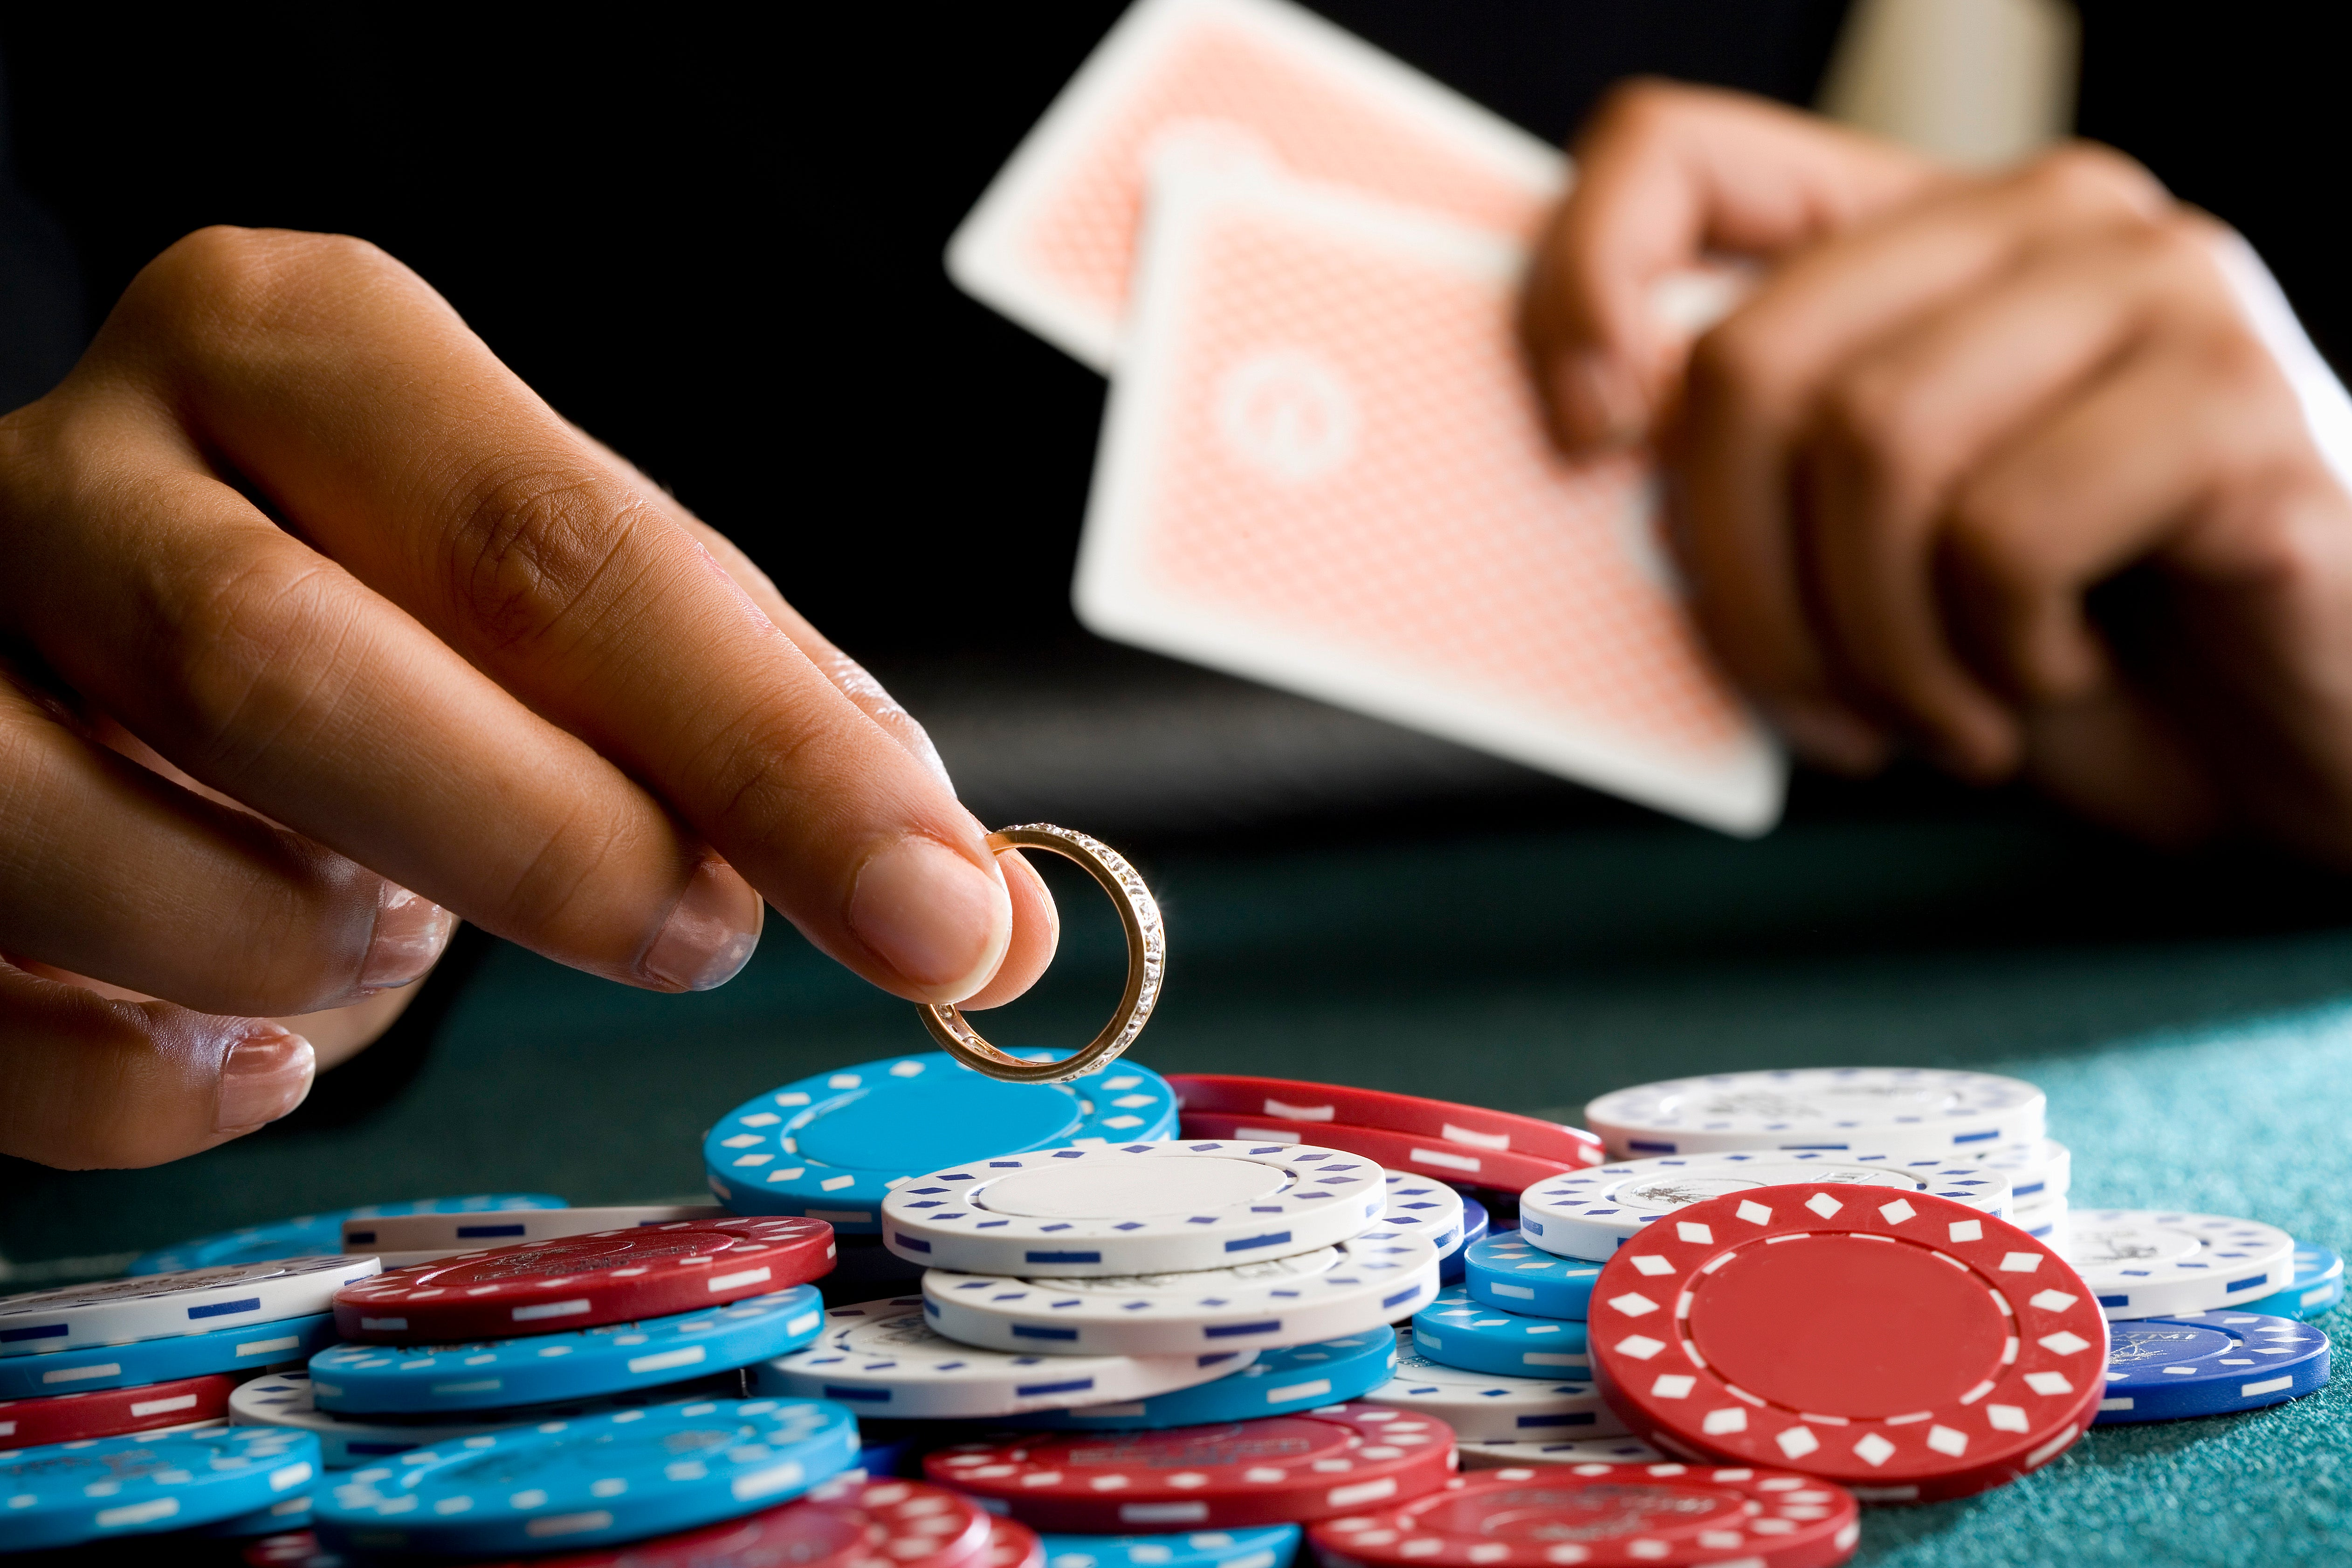 Reasons for compulsive gambling casino promotions